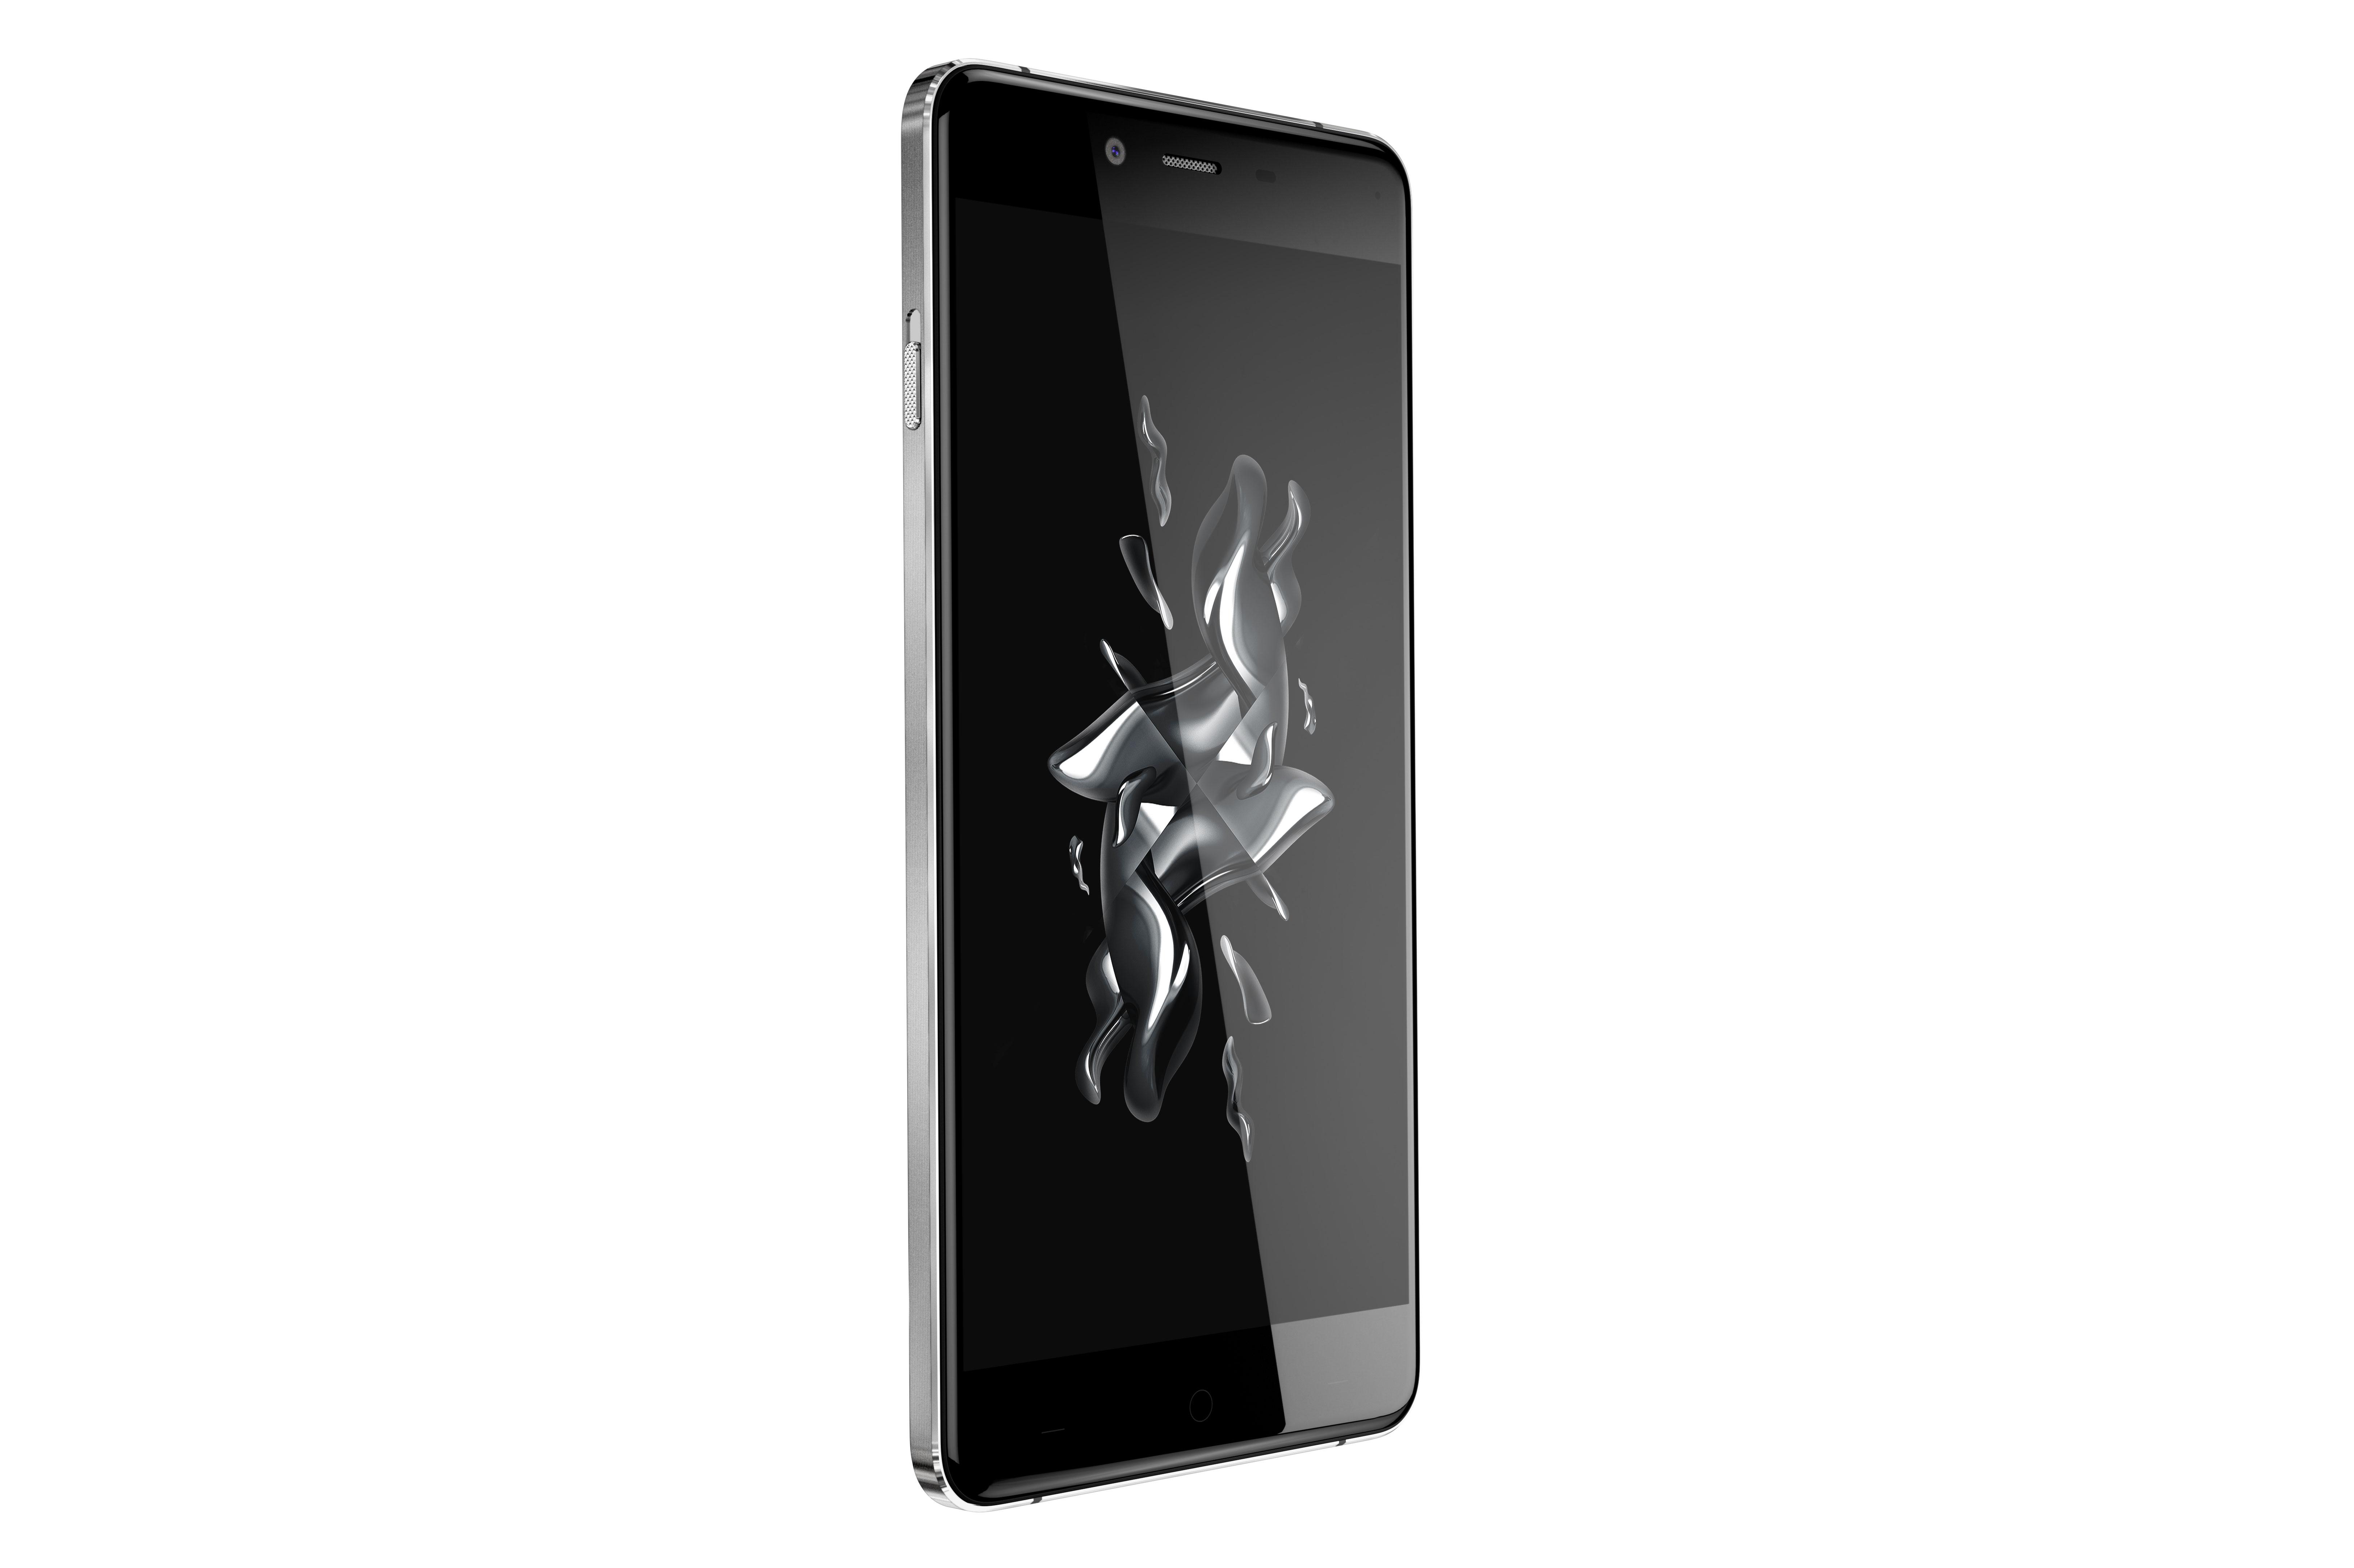 OnePlus X nun ohne Invite oneplus Das OnePlus X kann nun ohne Invite gekauft werden OnePlus X nun ohne Invite